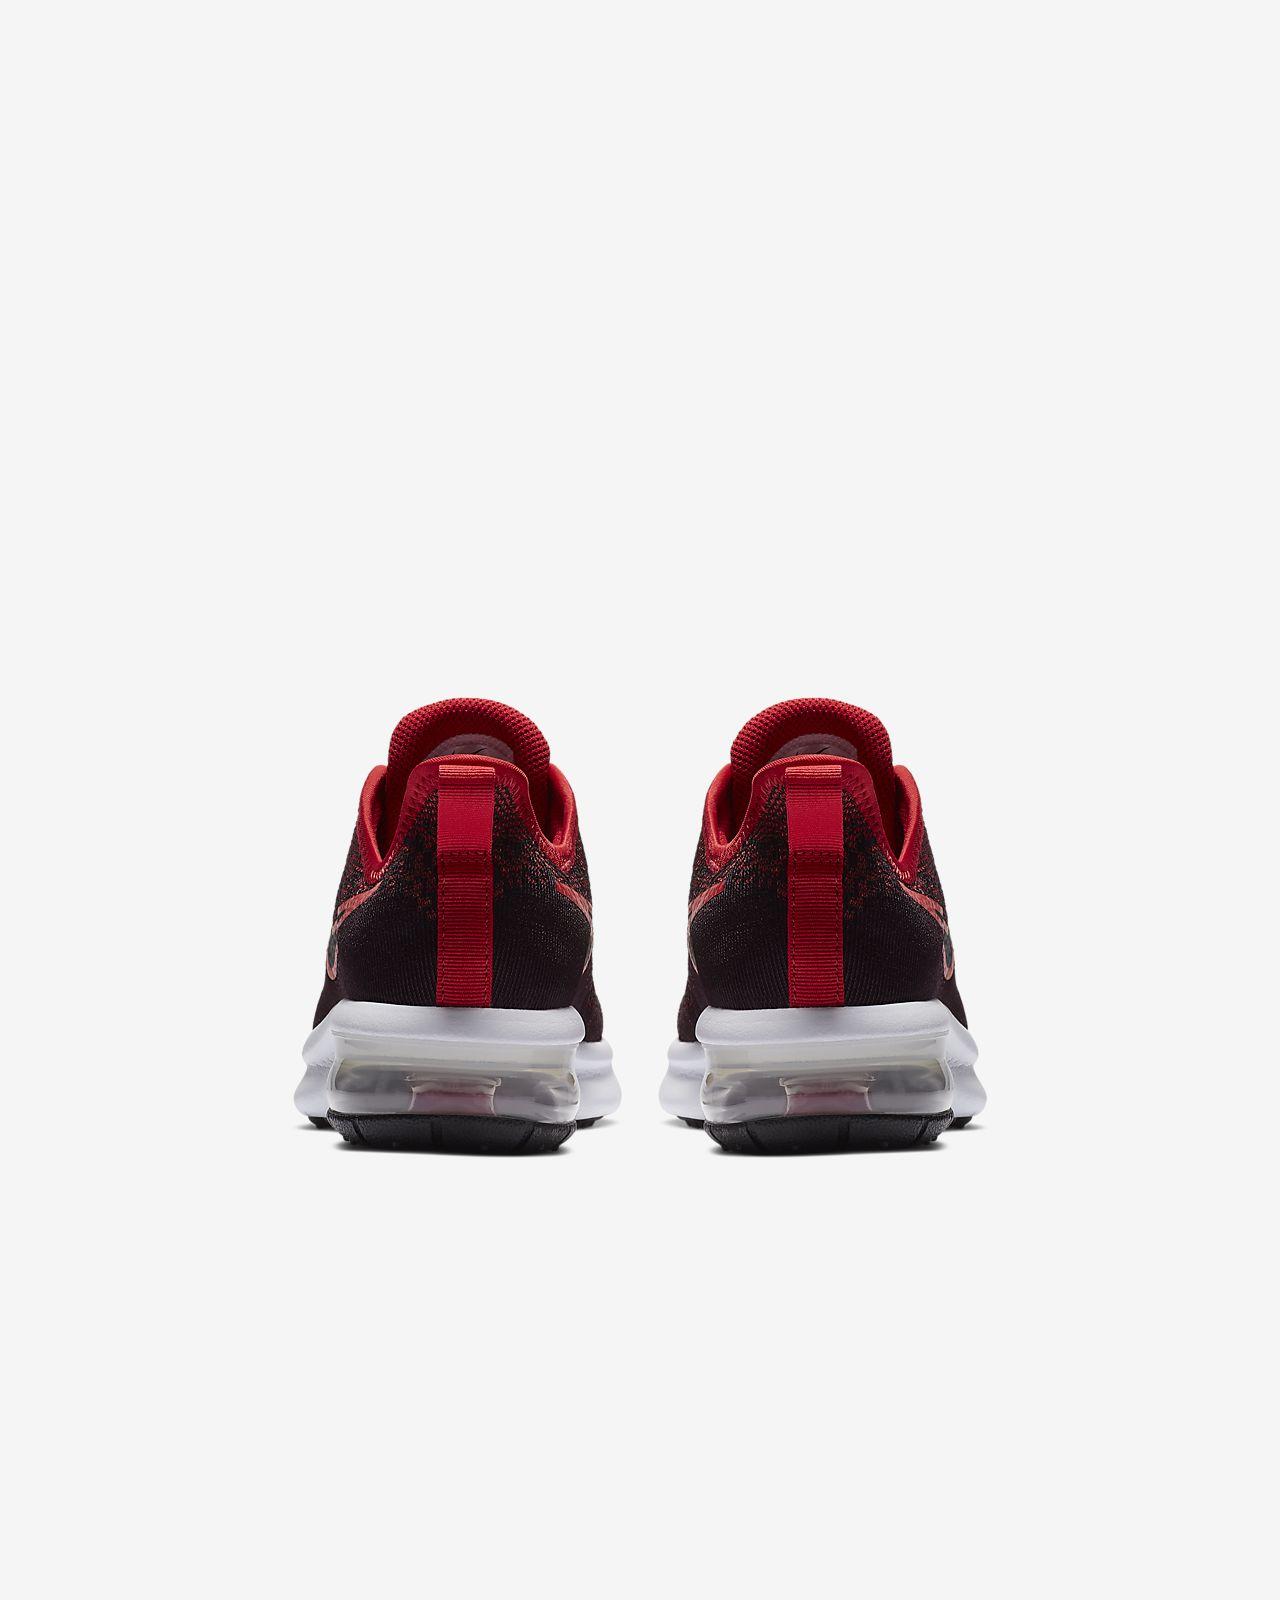 huge sale 5531b d82e6 ... Nike Air Max Sequent 4 Schuh für ältere Kinder